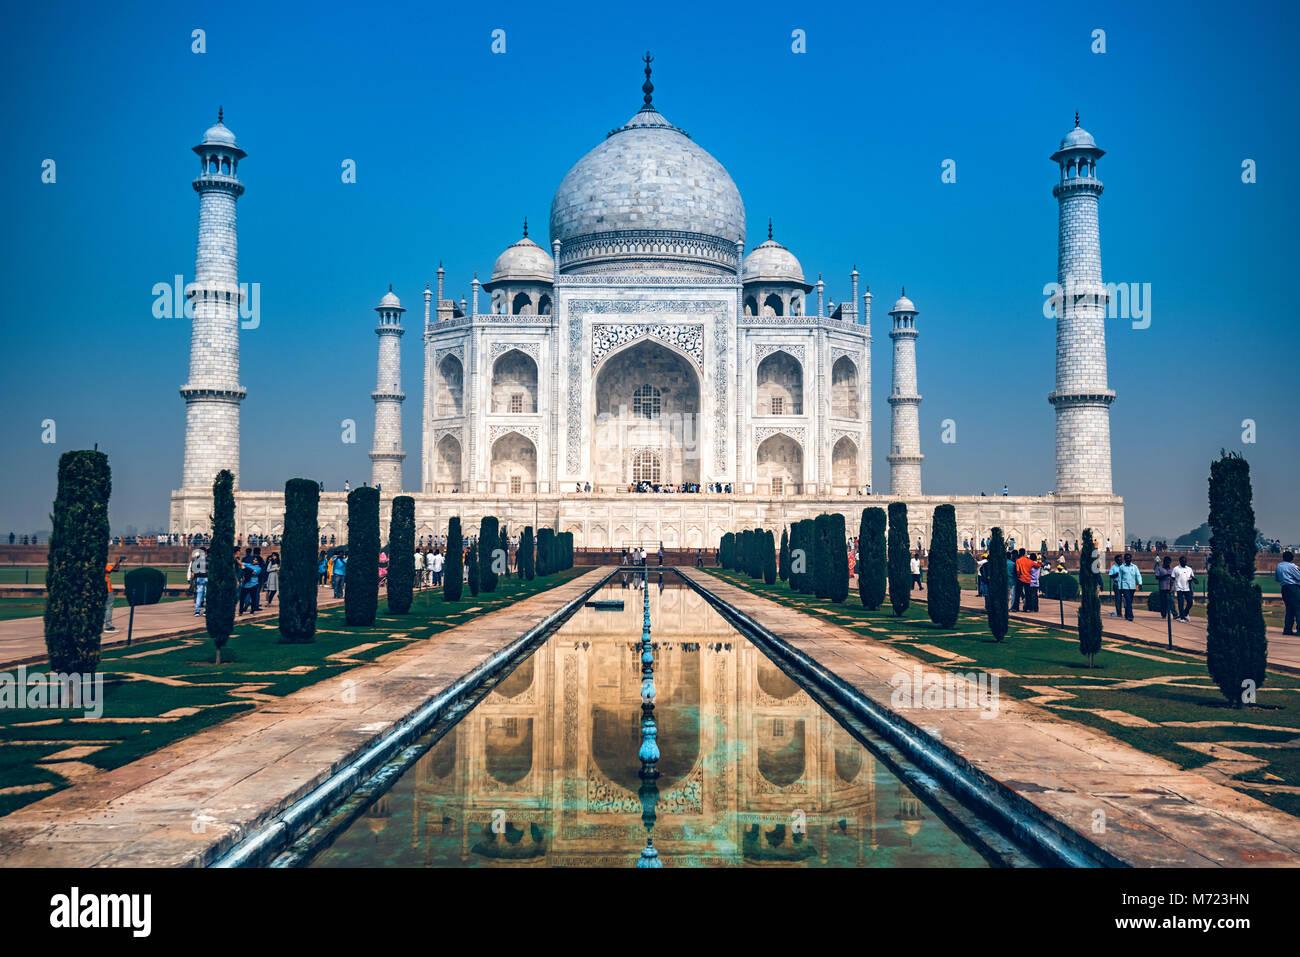 AGRA, Indien - 8. NOVEMBER 2017: Taj Mahal malerischen Blick in Agra, Indien. Stockbild